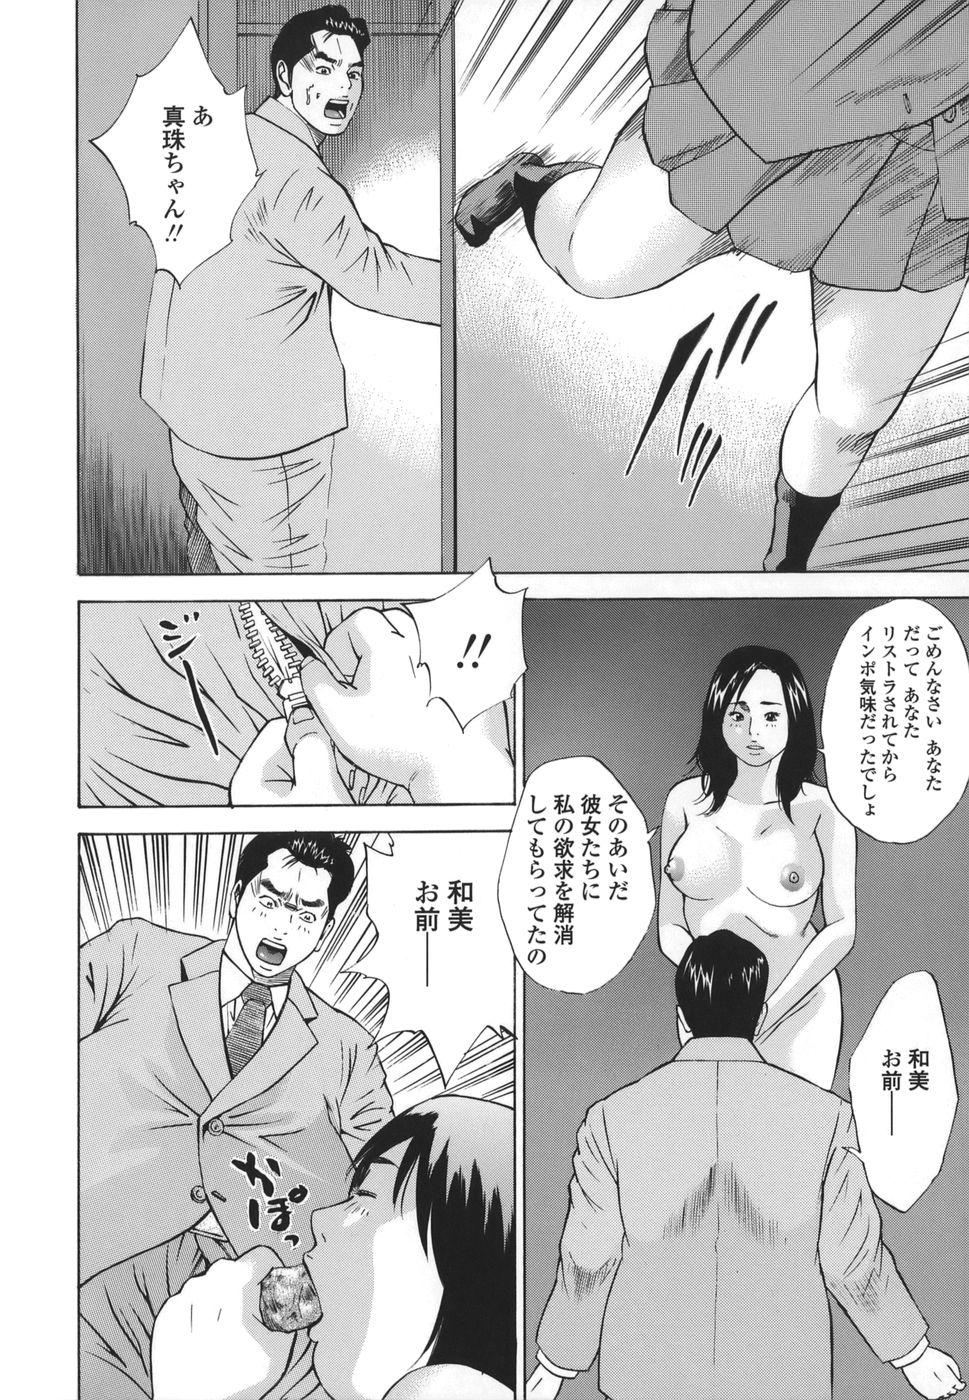 Kinshin Goukan - Near Relation Rapes 117